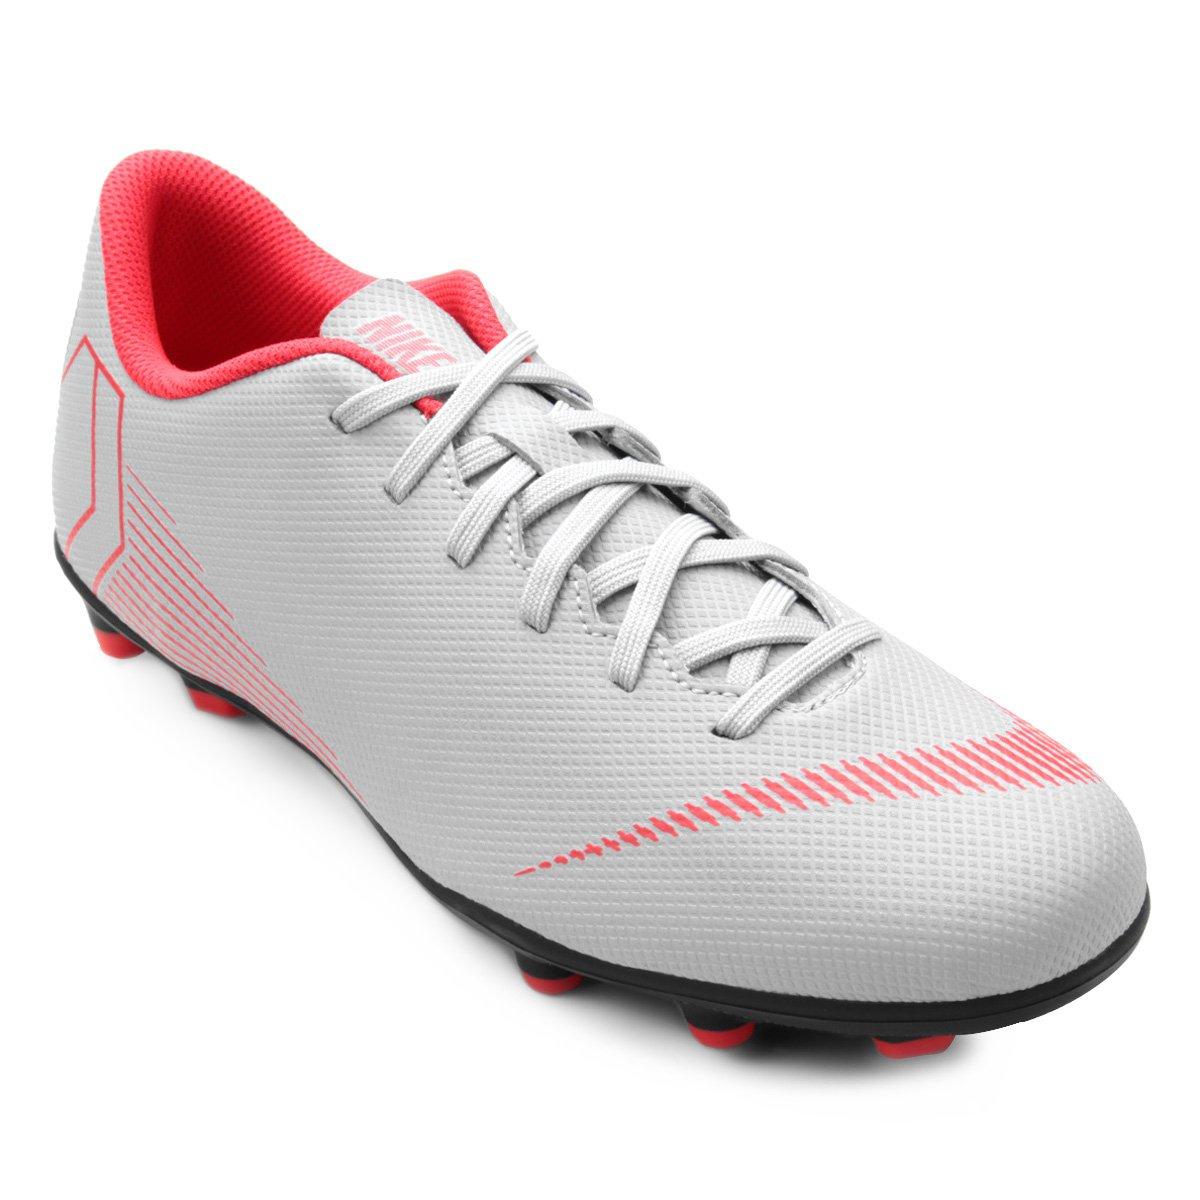 9426776d0b Chuteira Campo Nike Mercurial Vapor 12 Club - Cinza - Compre Agora ...